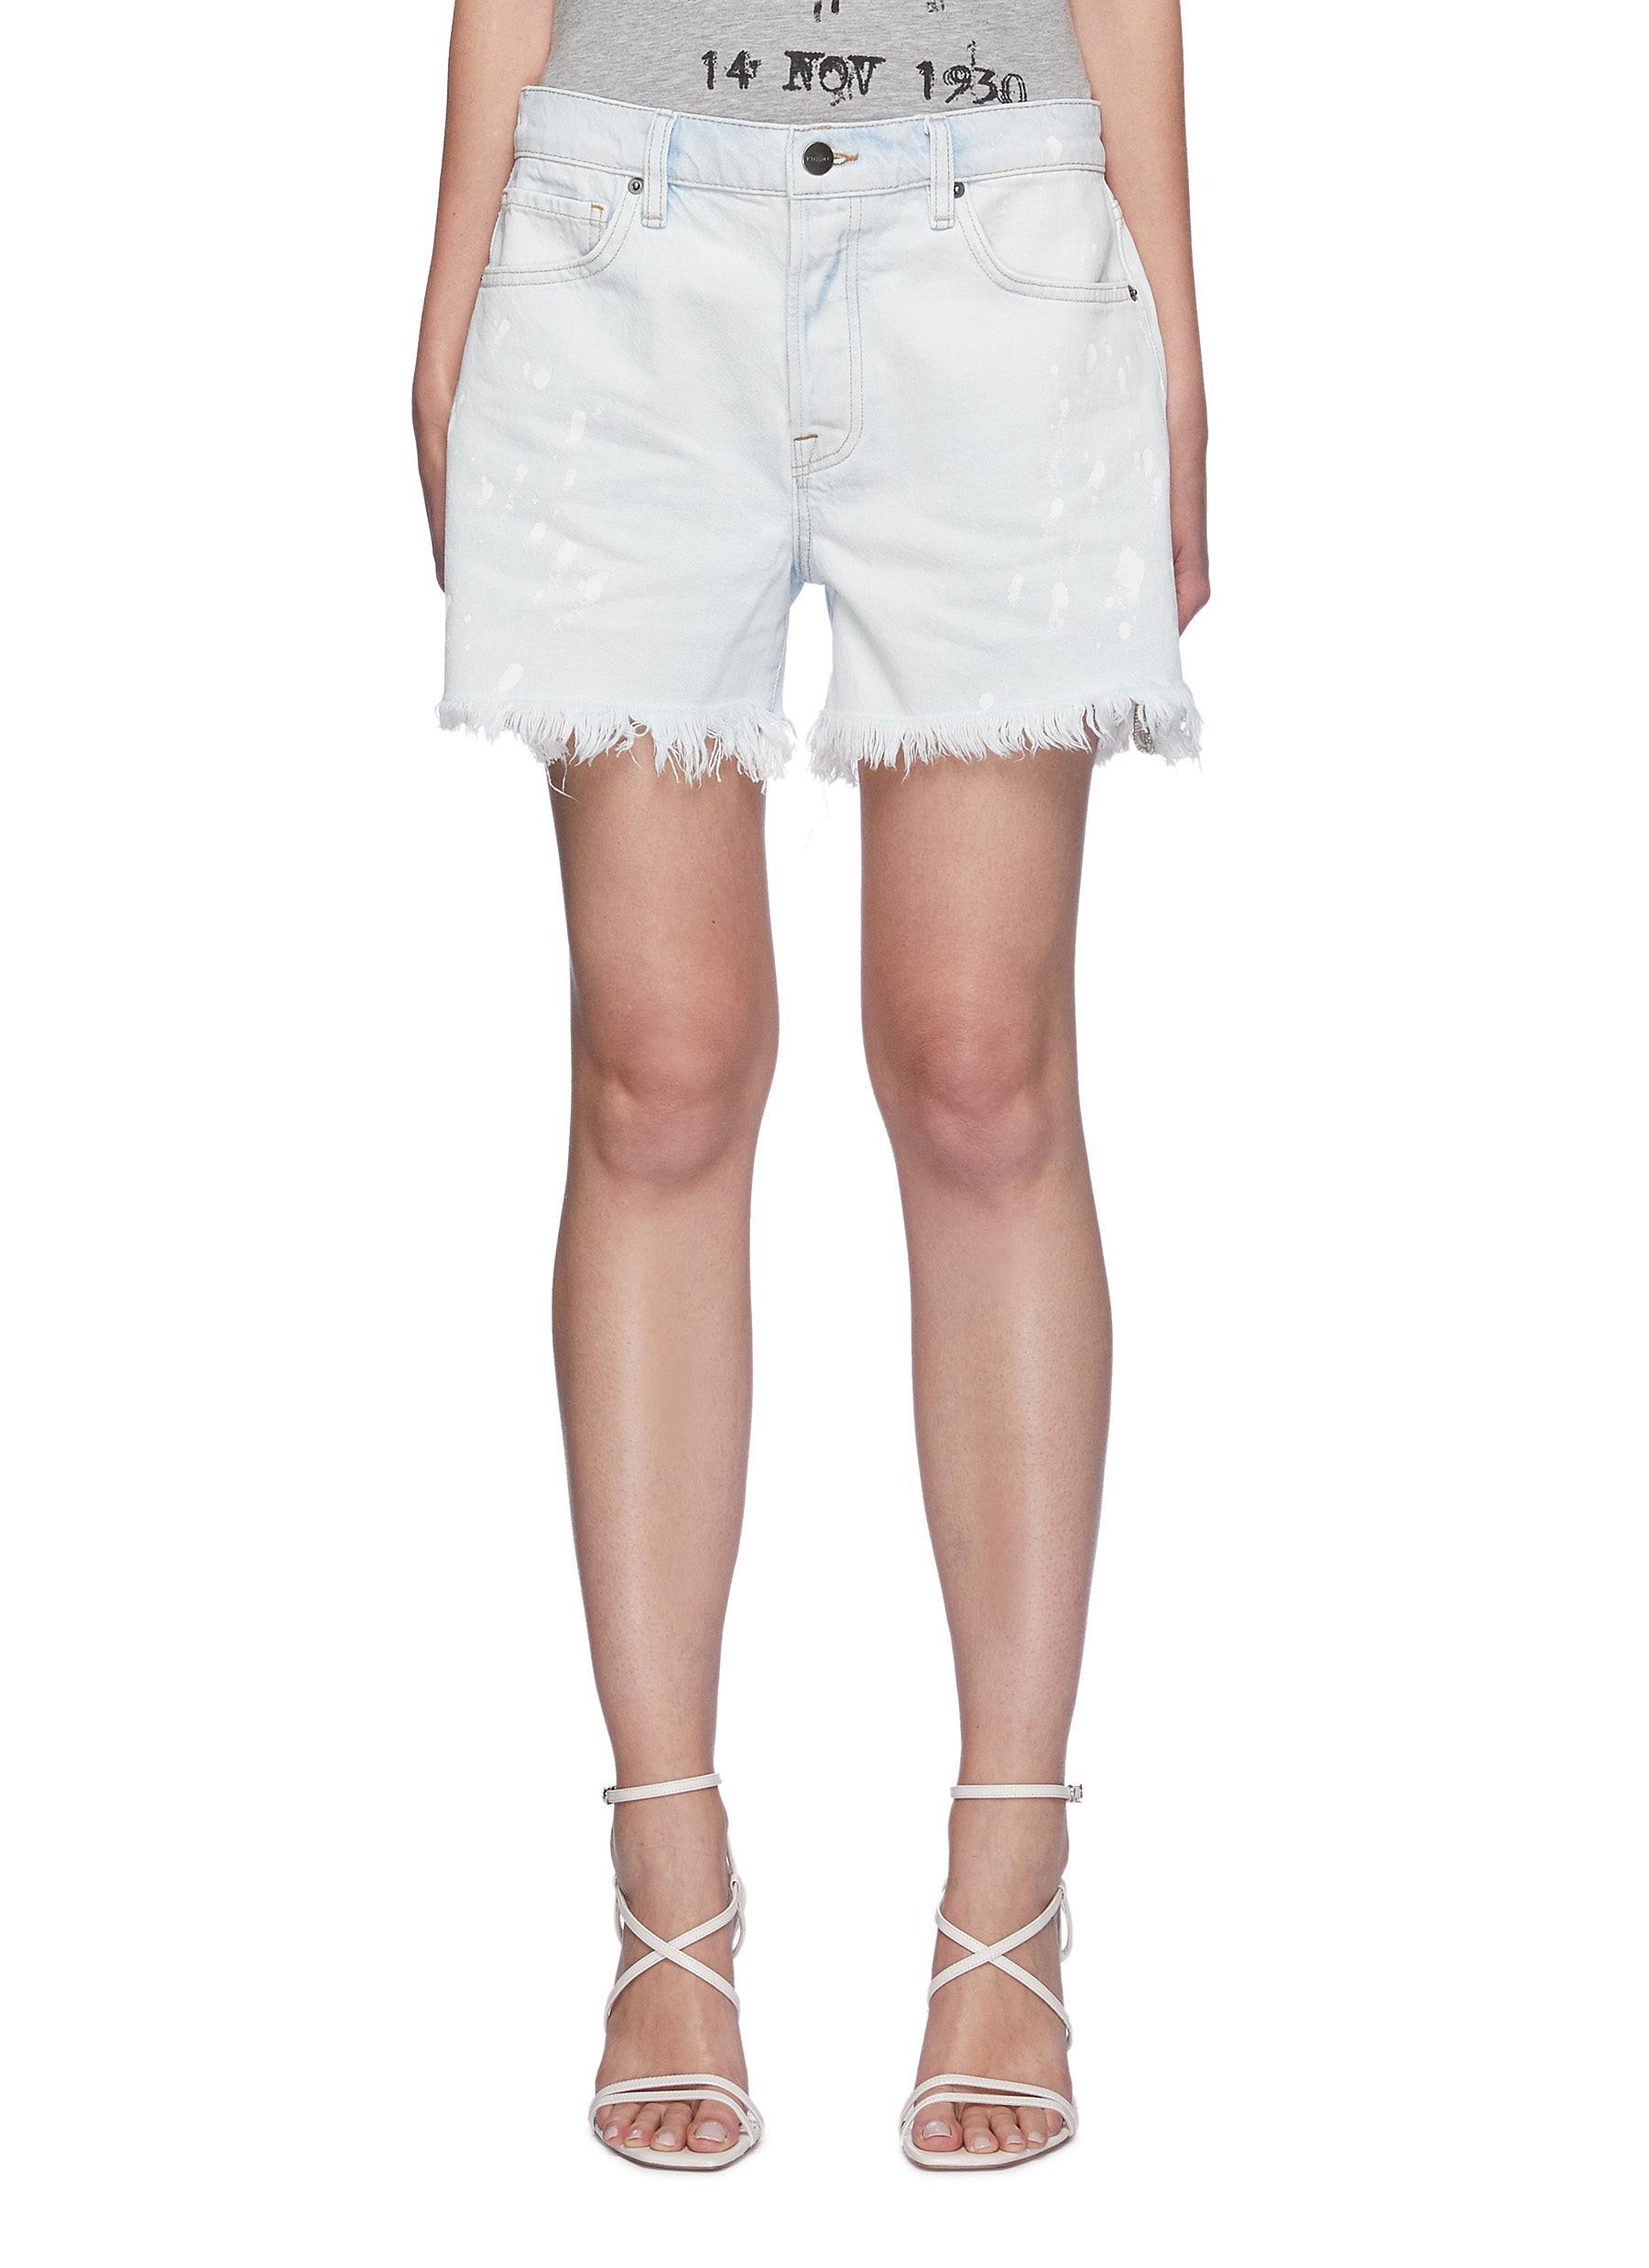 """""Le Slouch' Splash Bleach pattern raw hem shorts"""